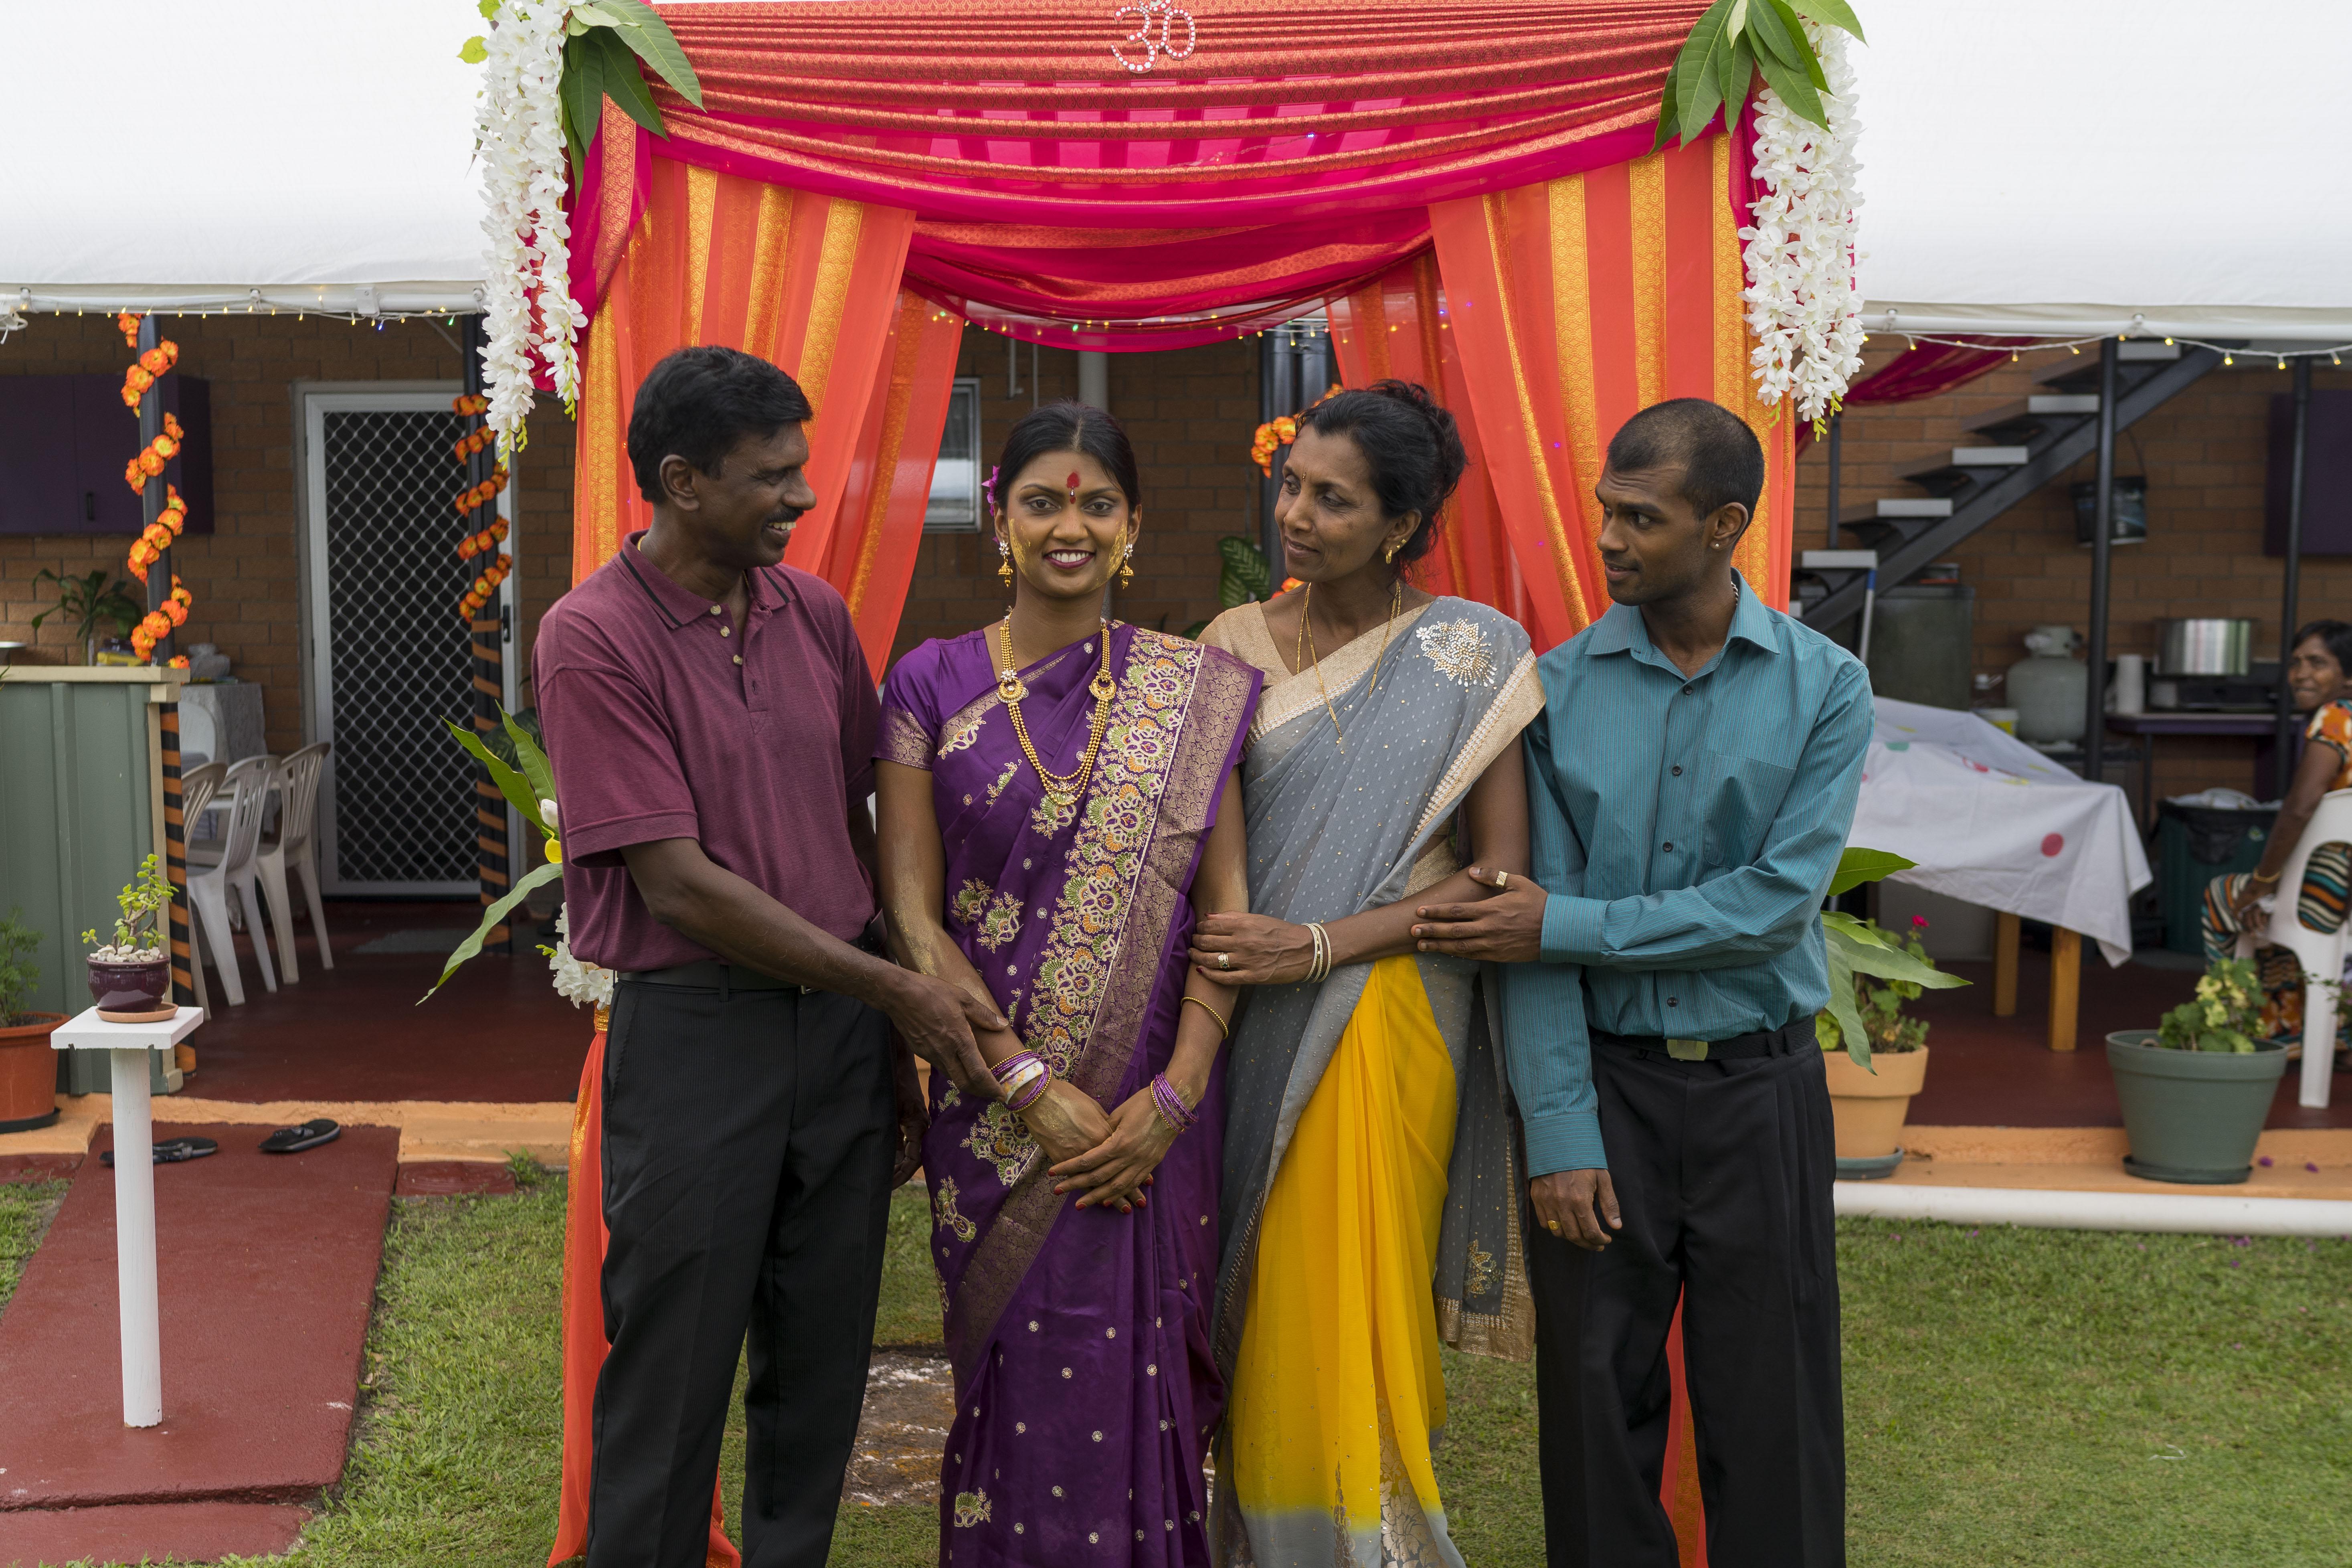 Hindu bride and family